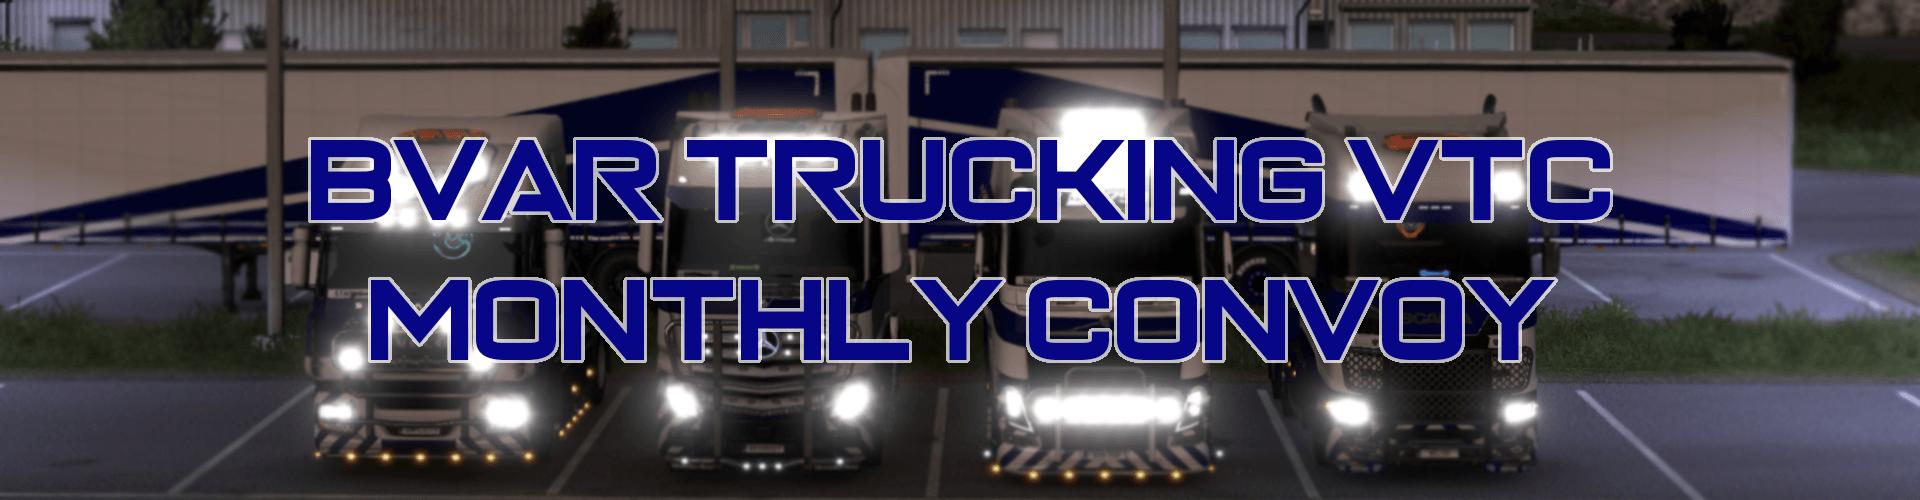 BVAR Trucking November Monthly Convoy